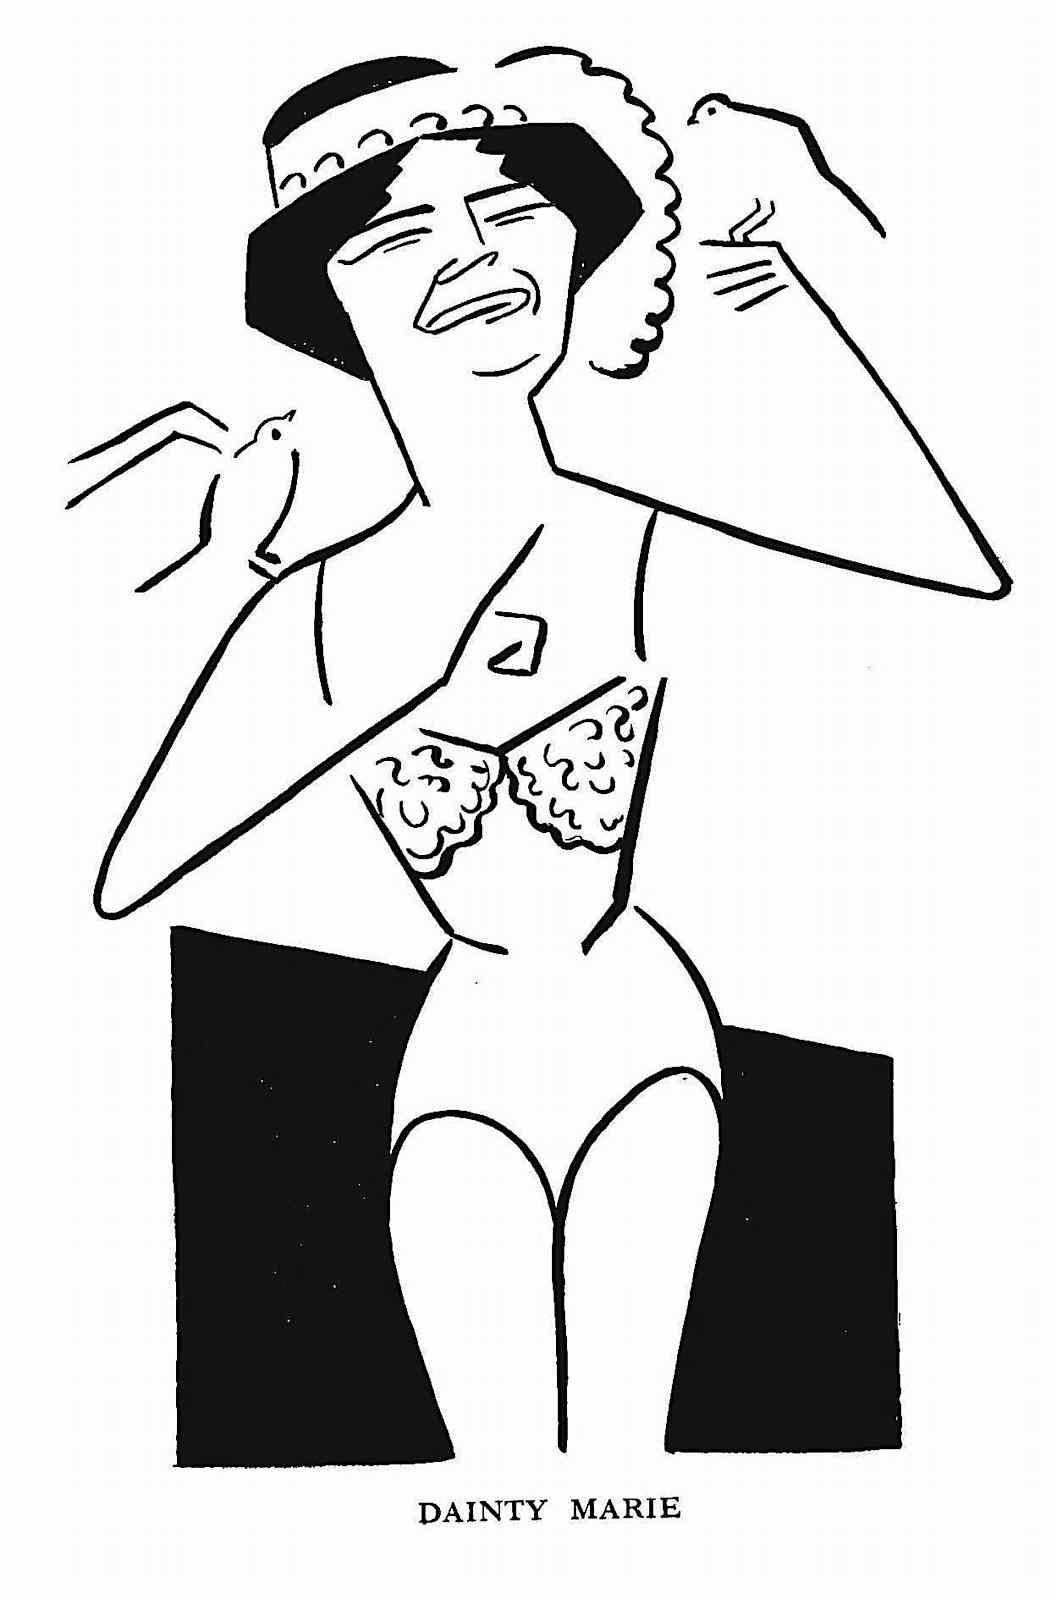 a 1915 Vaudeville performer, Dainty Marie